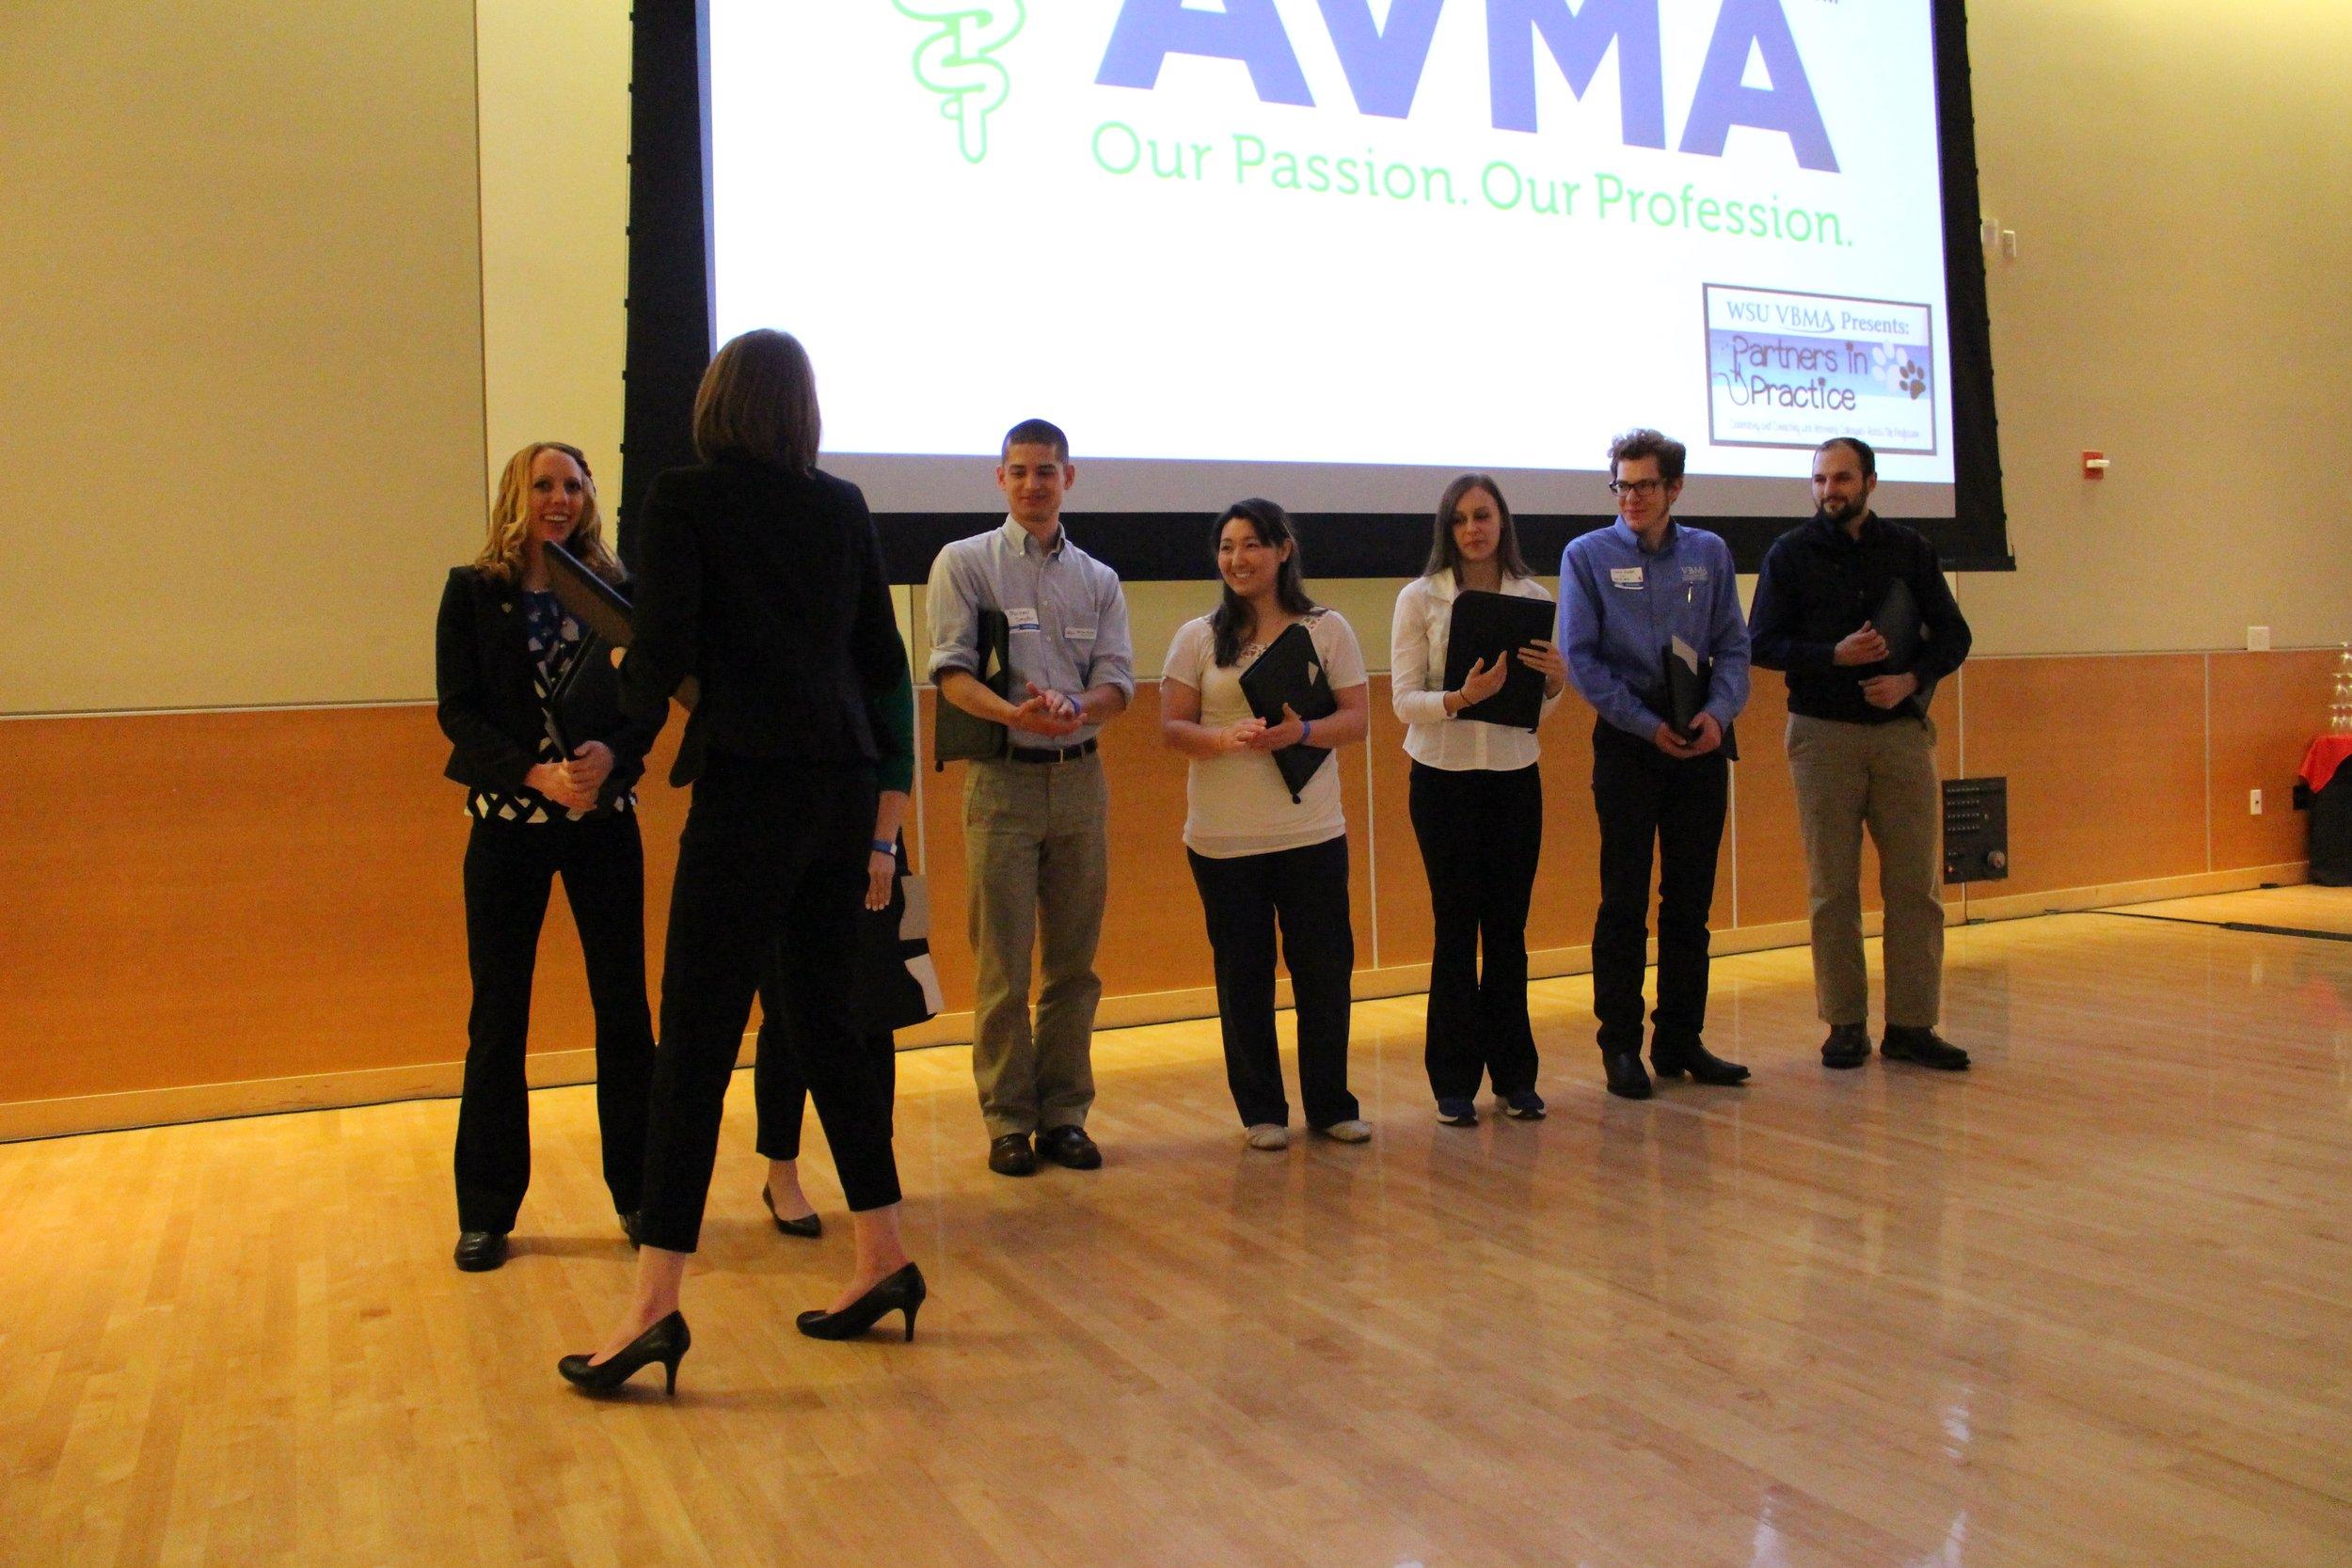 VBMA Partners in Practice - 61 of 129.jpg